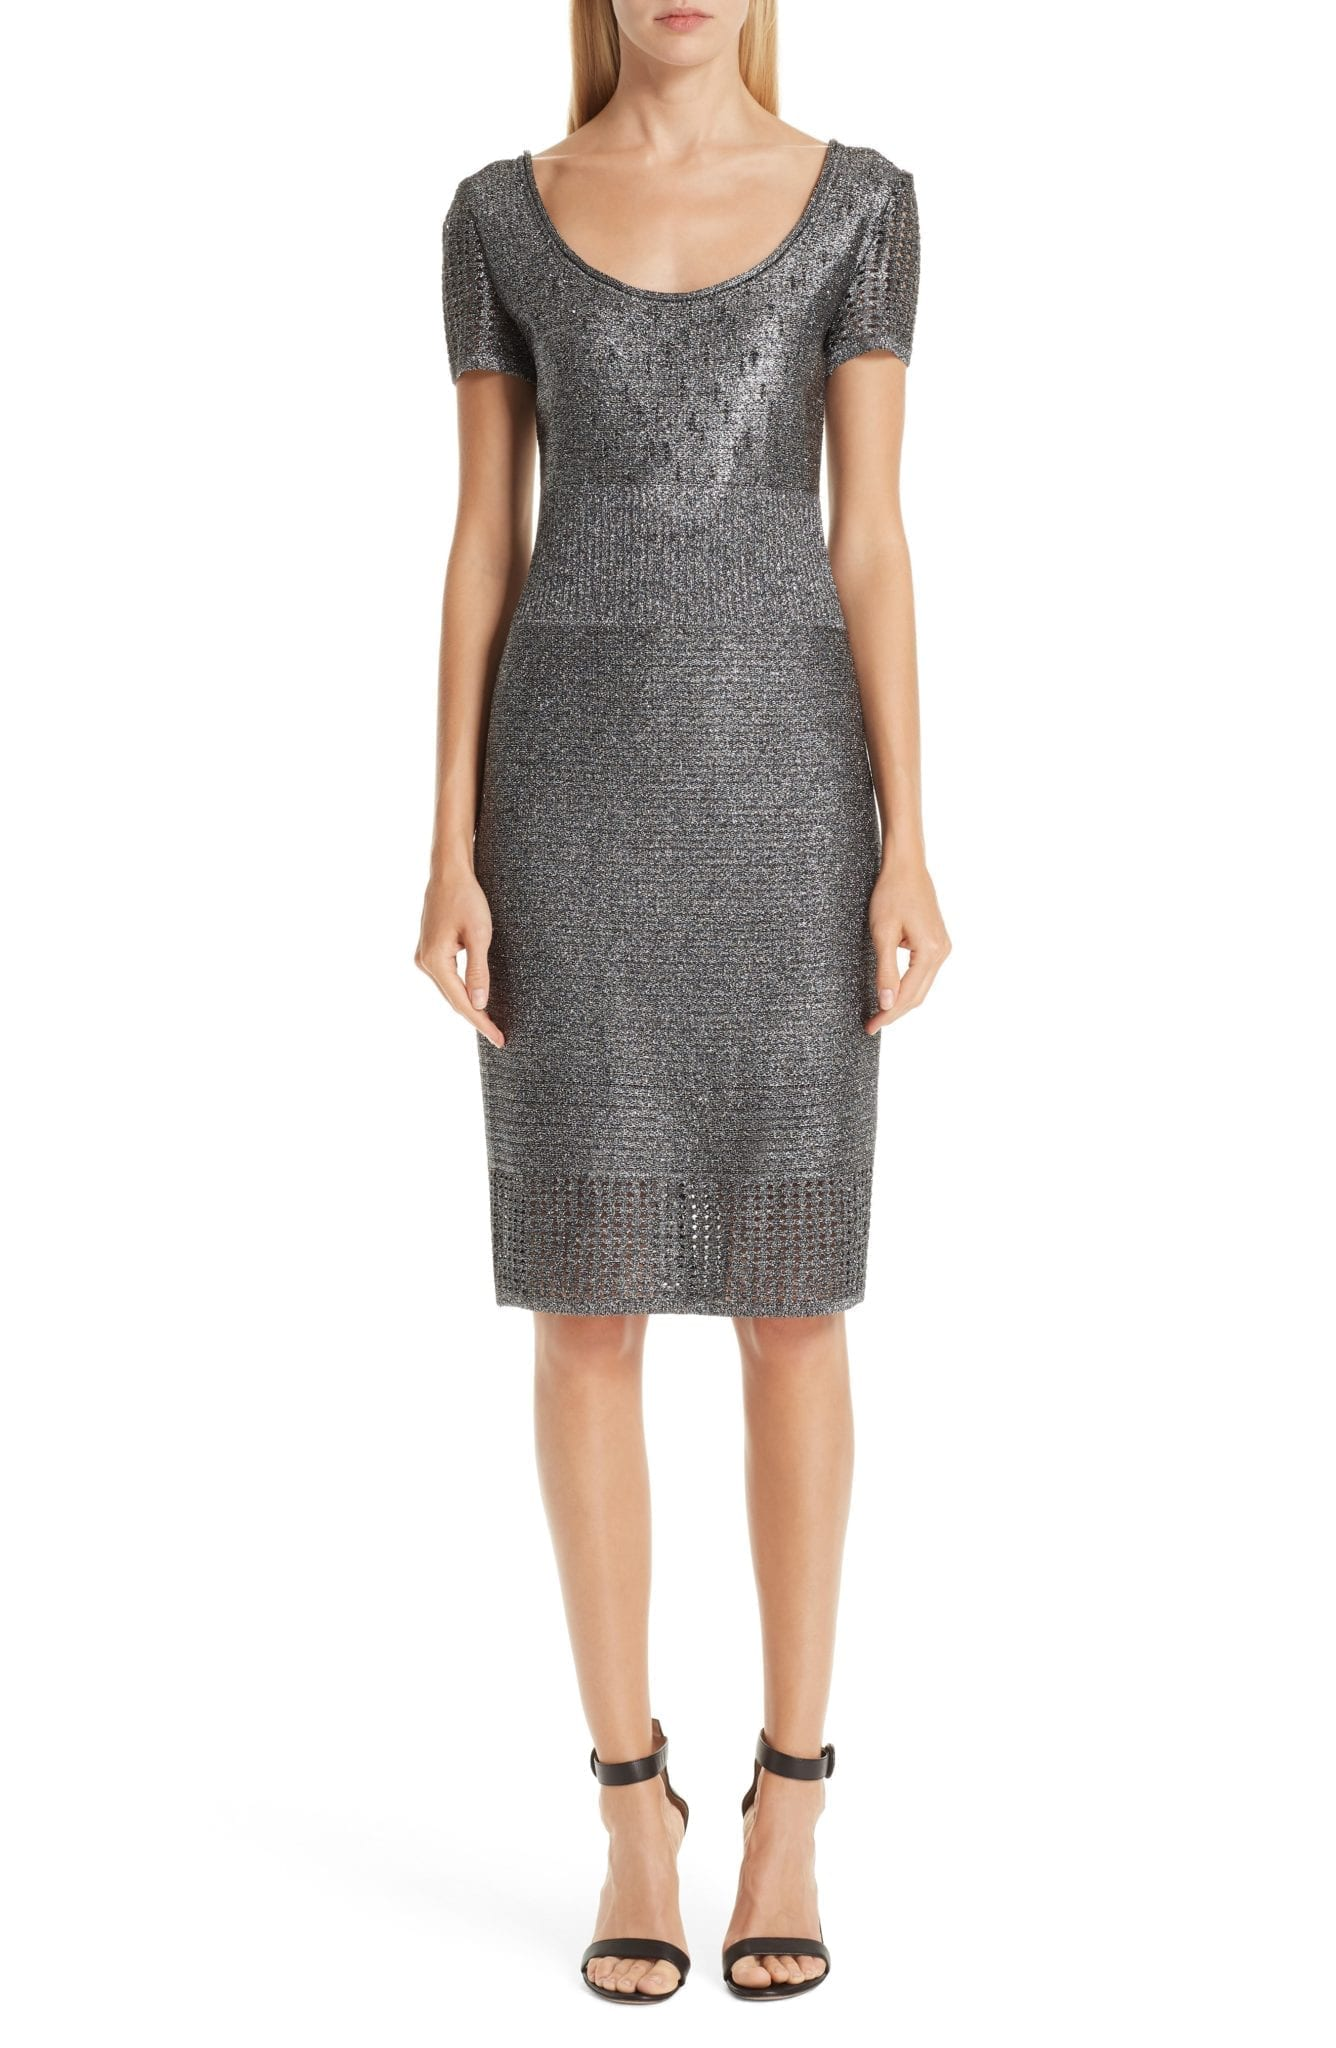 ST. JOHN COLLECTION Metallic Plaited Mixed Knit Gunmetal / Caviar Dress